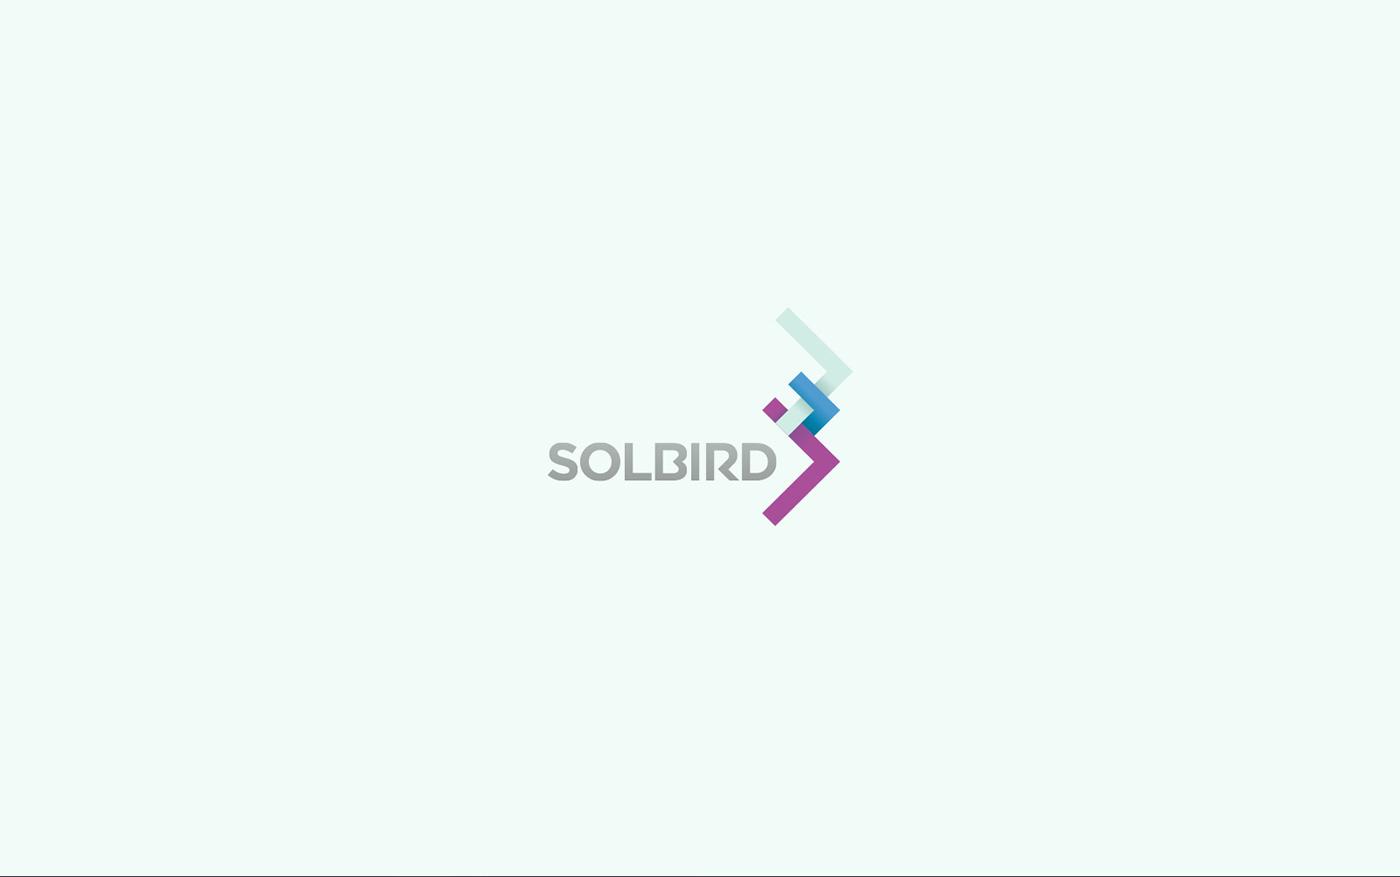 logo brand identity design graphic corporate stationary creative agency